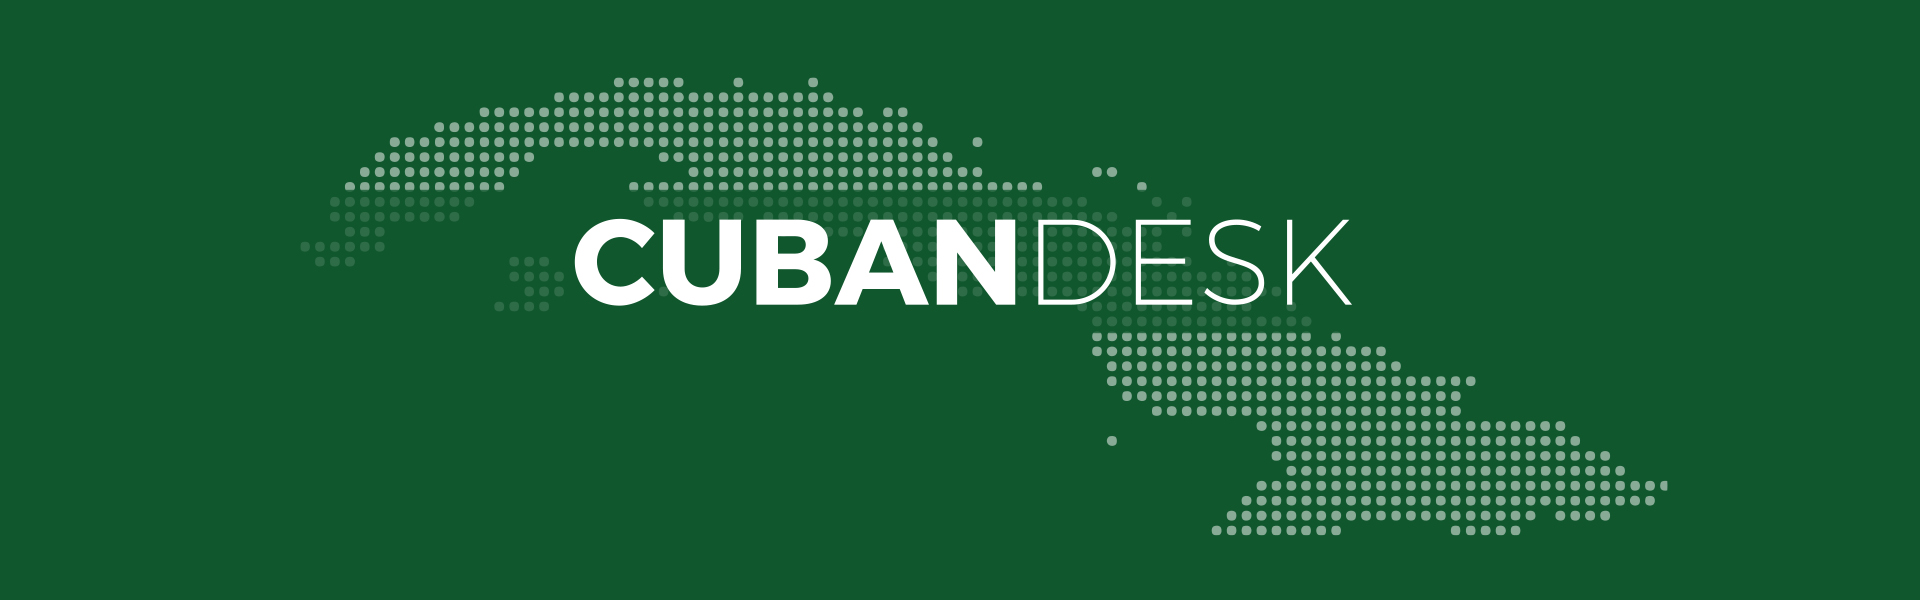 Cuban Desk